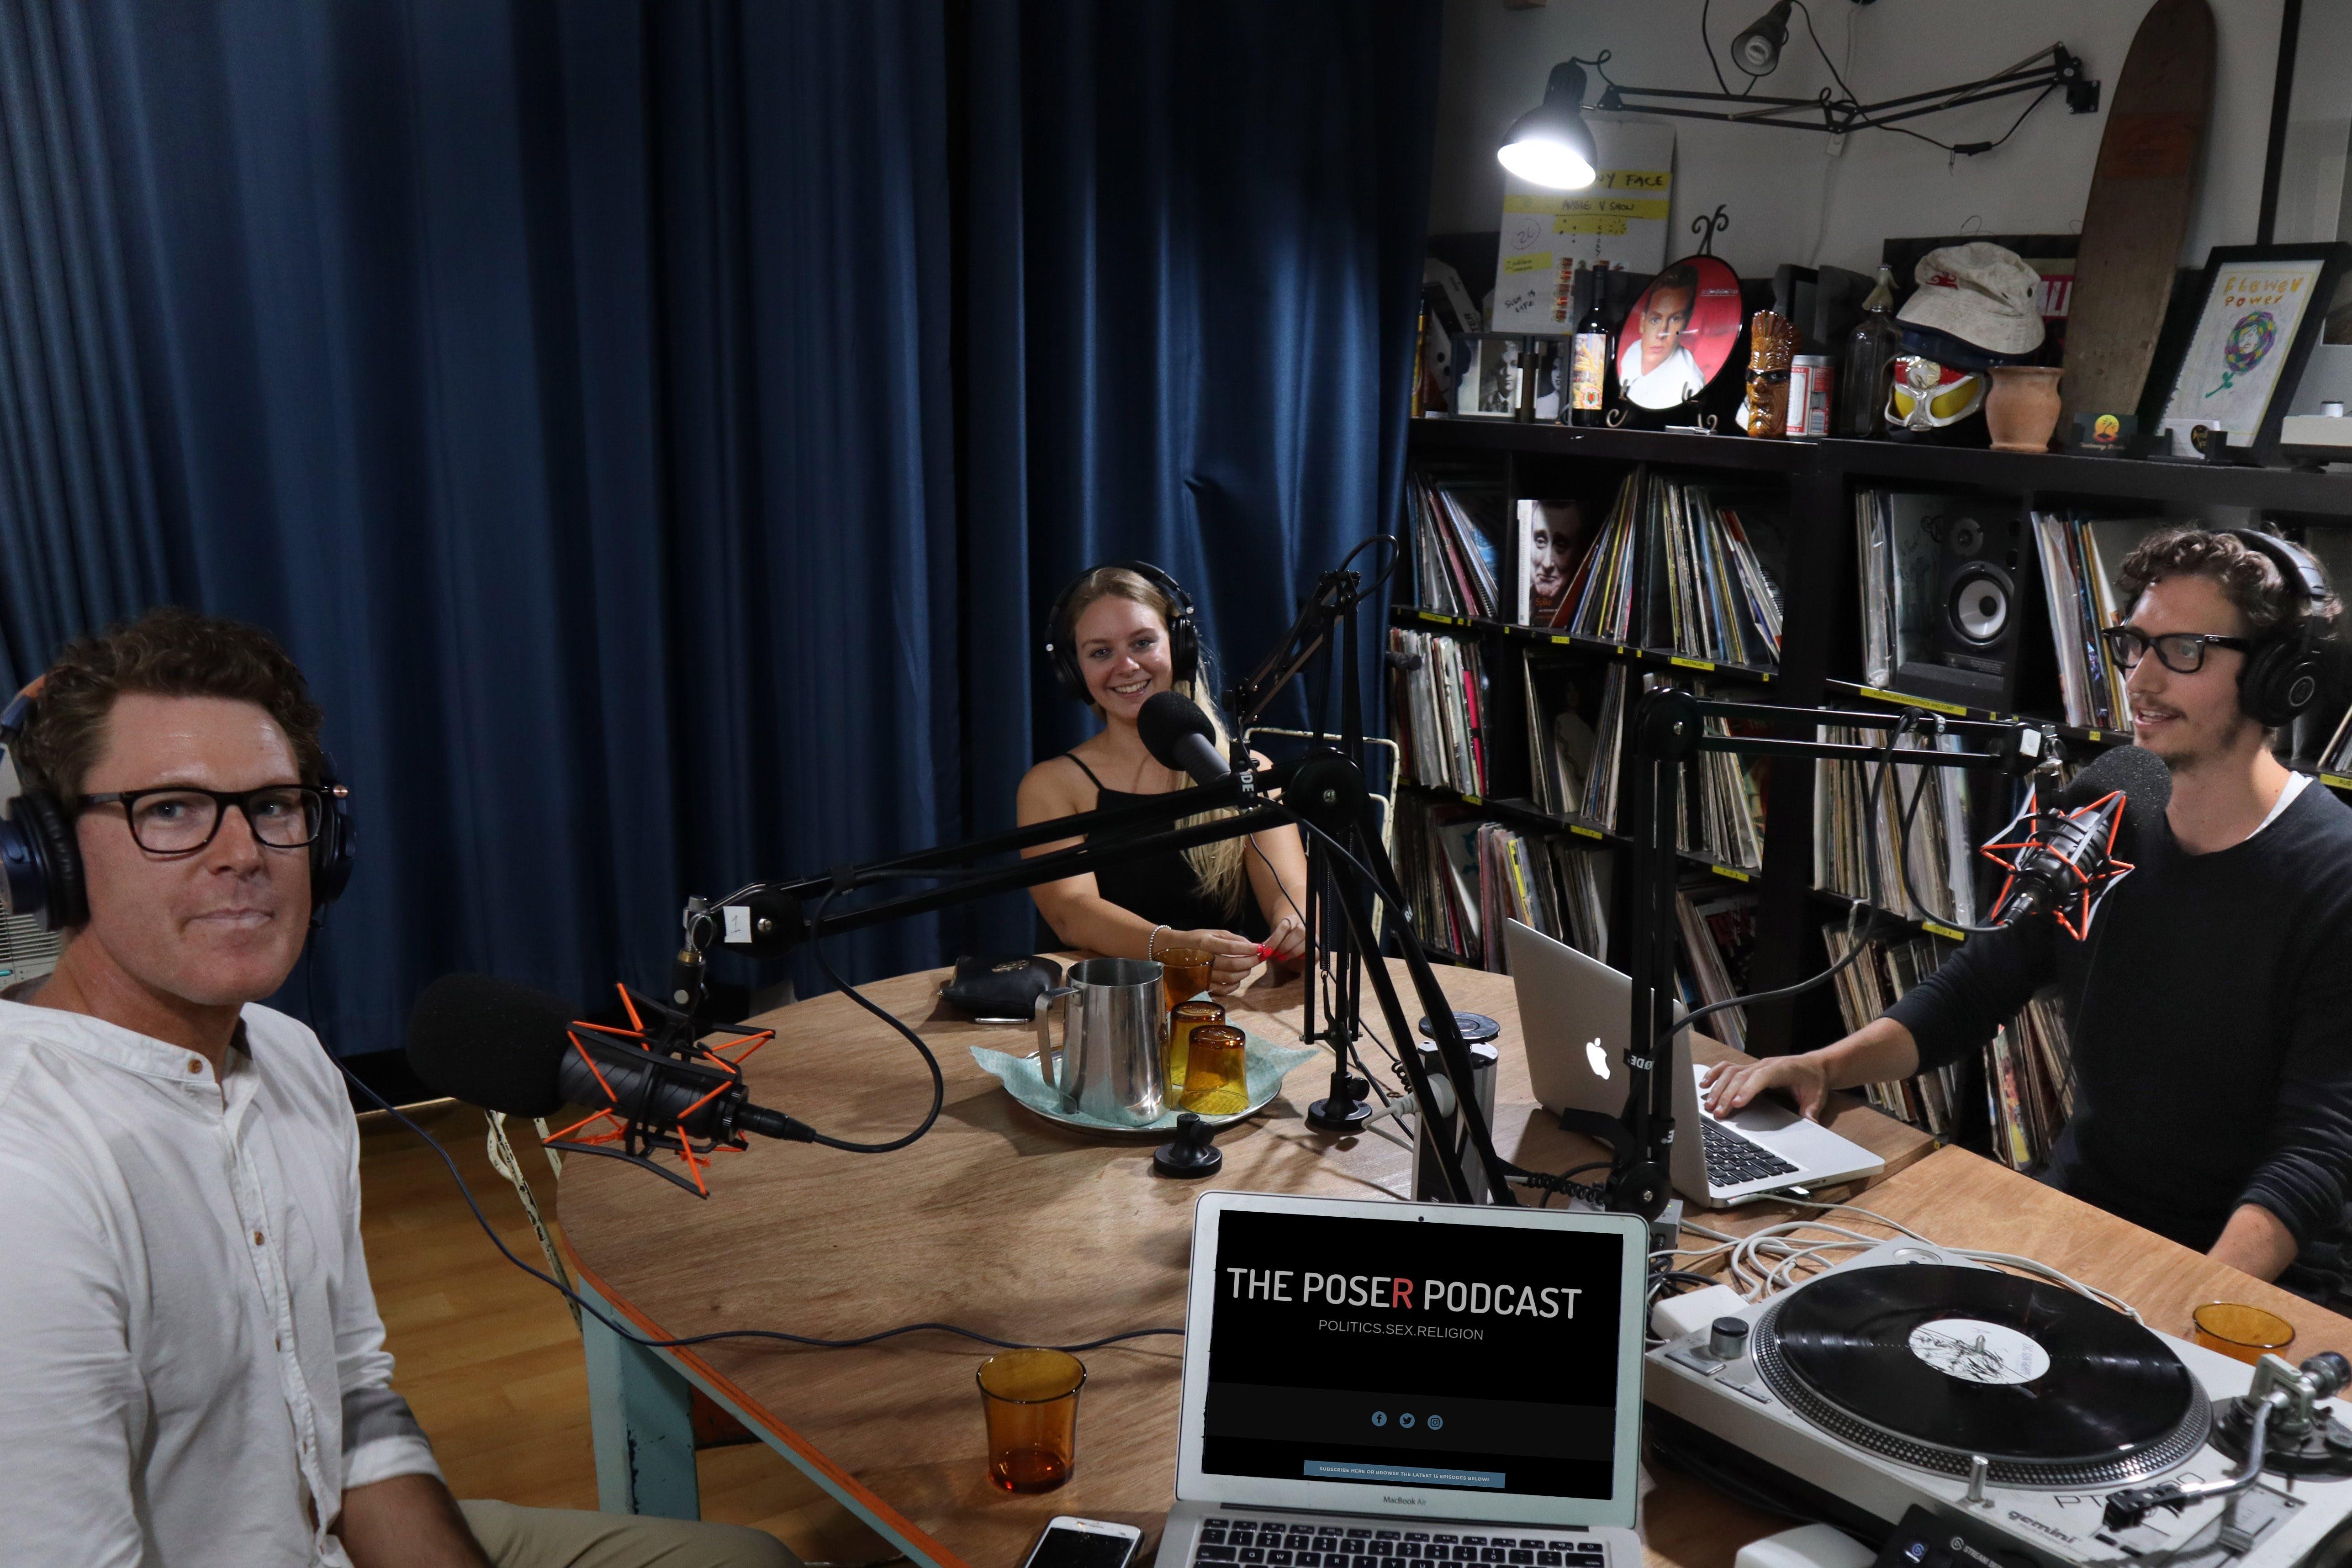 The Vinyl Room, creative studio at Castaway Studios - Podcasting Studio, image 8